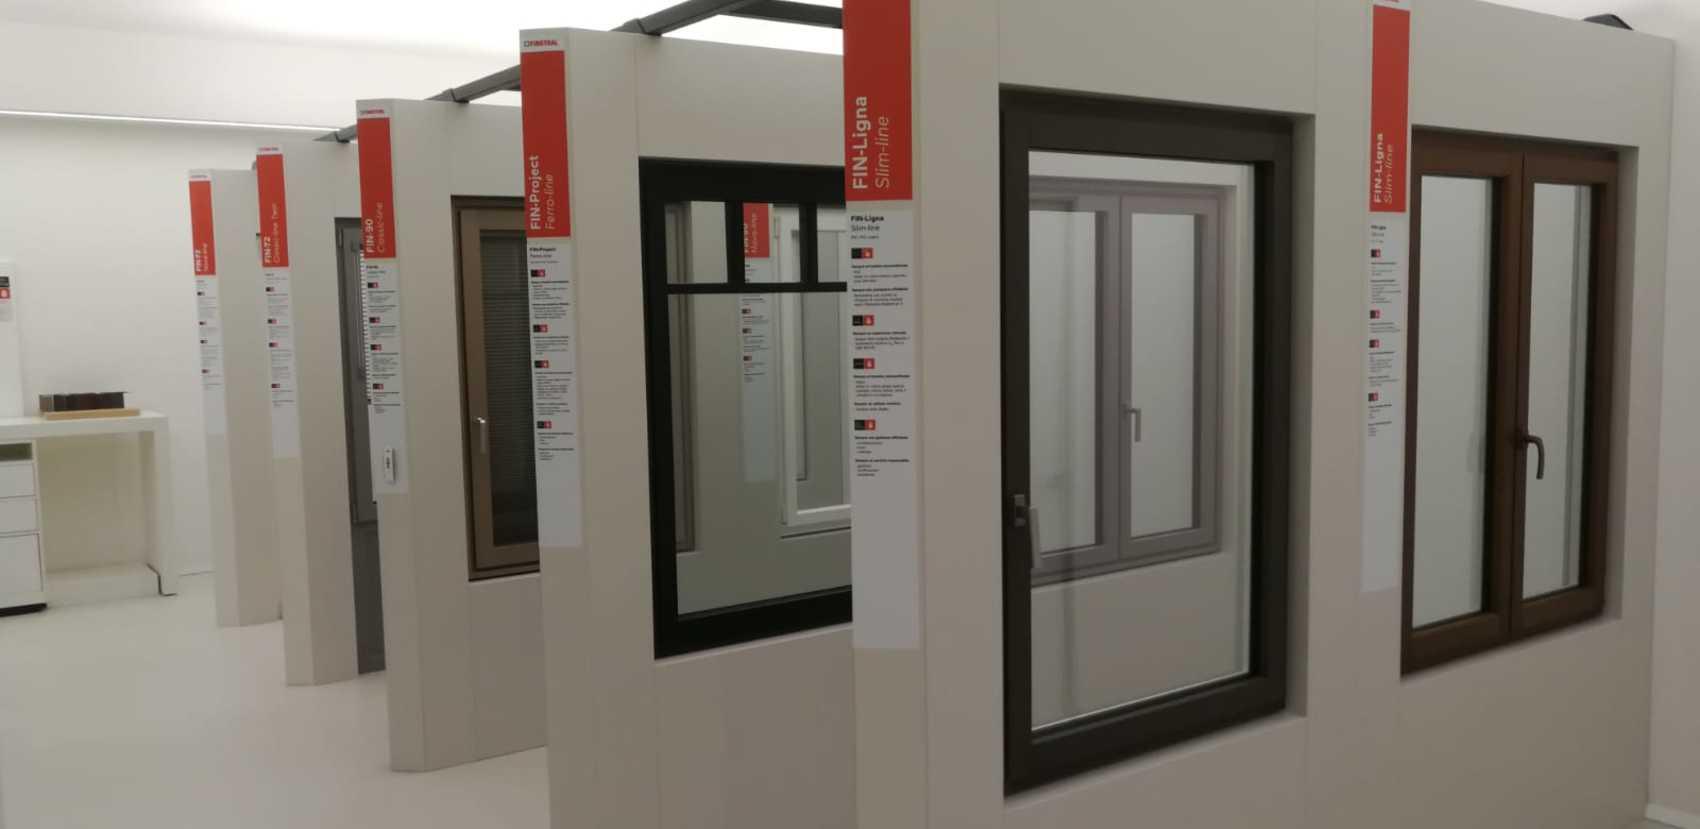 Diversi sistemi di serramenti tra cui scegliere, sviluppati secondo i più elevati standard di qualità.